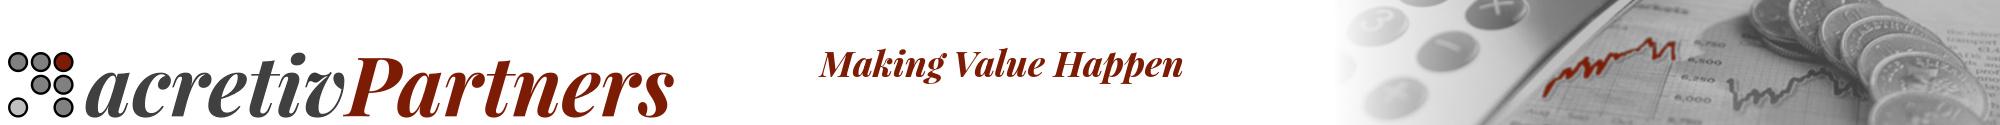 acretivPartners Consulting